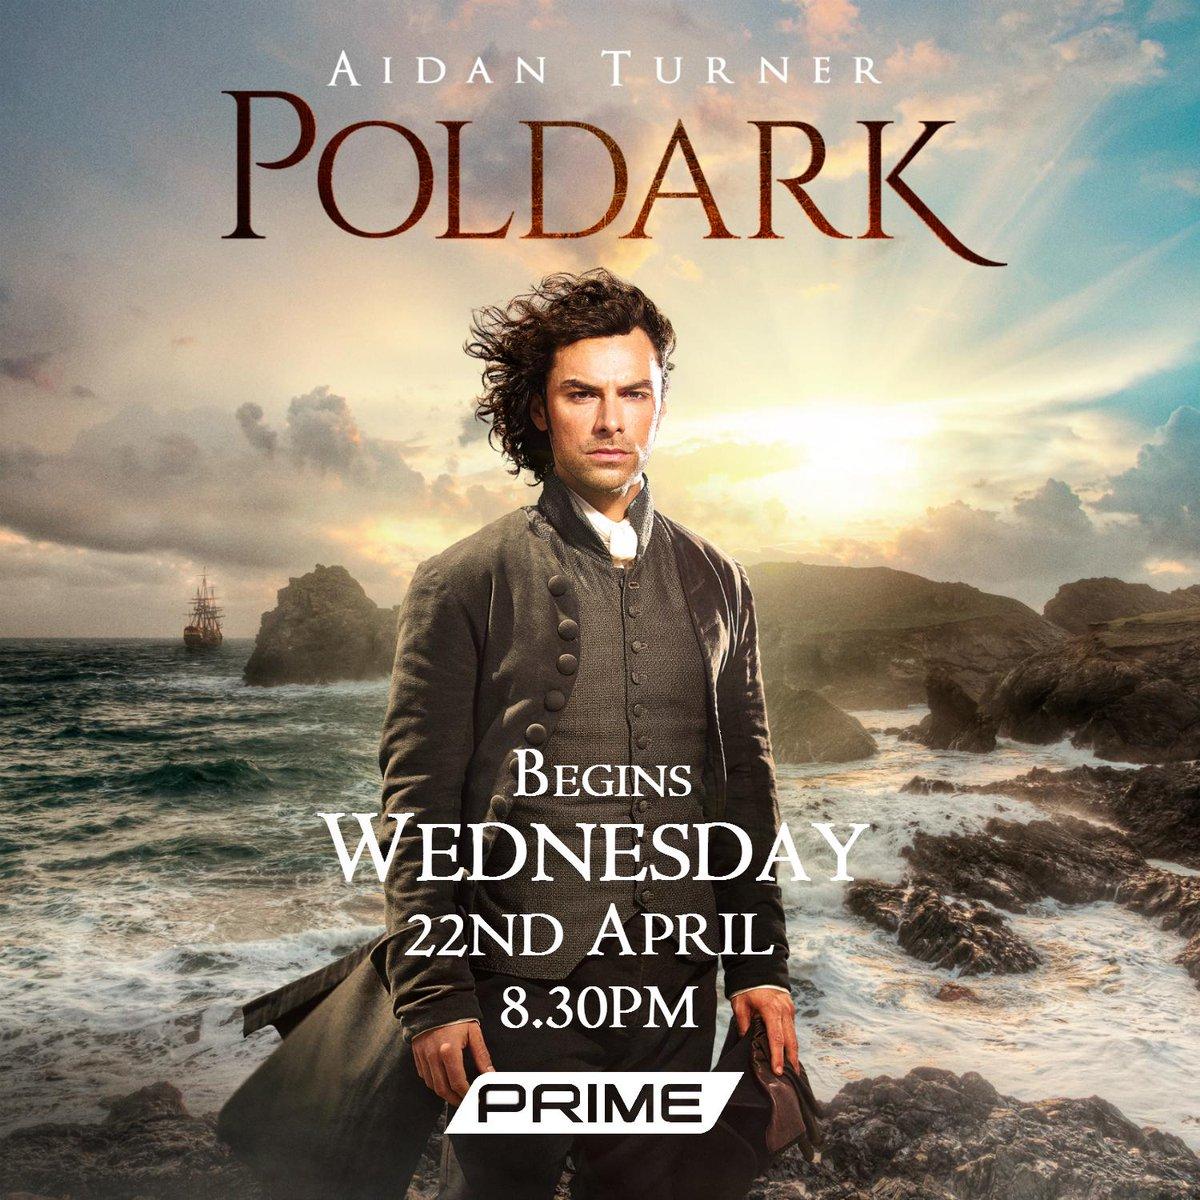 Epic new saga #Poldark begins in NZ from Wed April 22nd, 8.30pm on @Primetv_NZ! @PoldarkTV @AidanTurner http://t.co/J43ft3sJO4